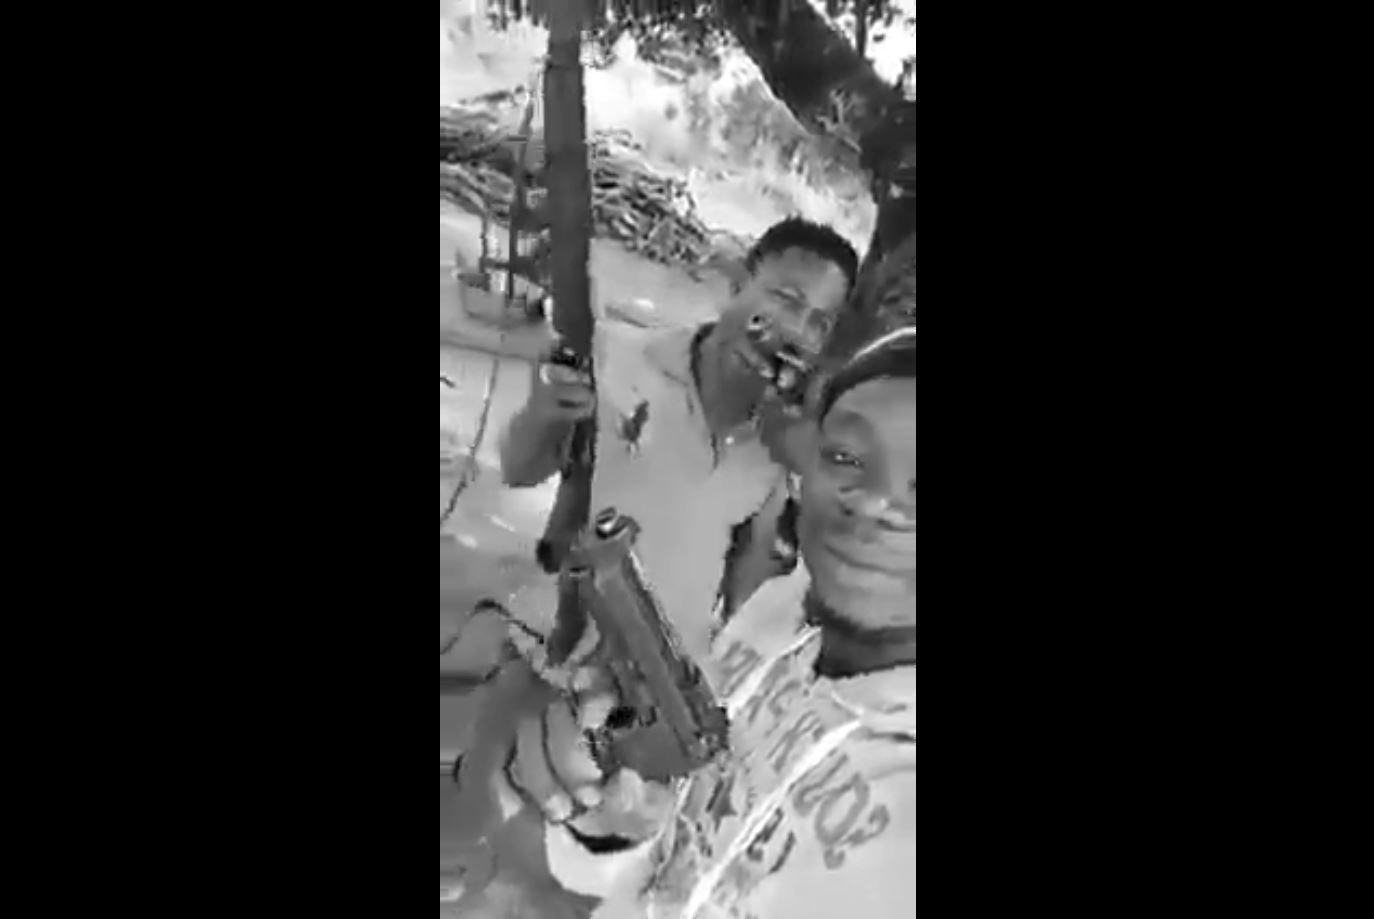 Video of young men brandishing guns surface after bullion van heist